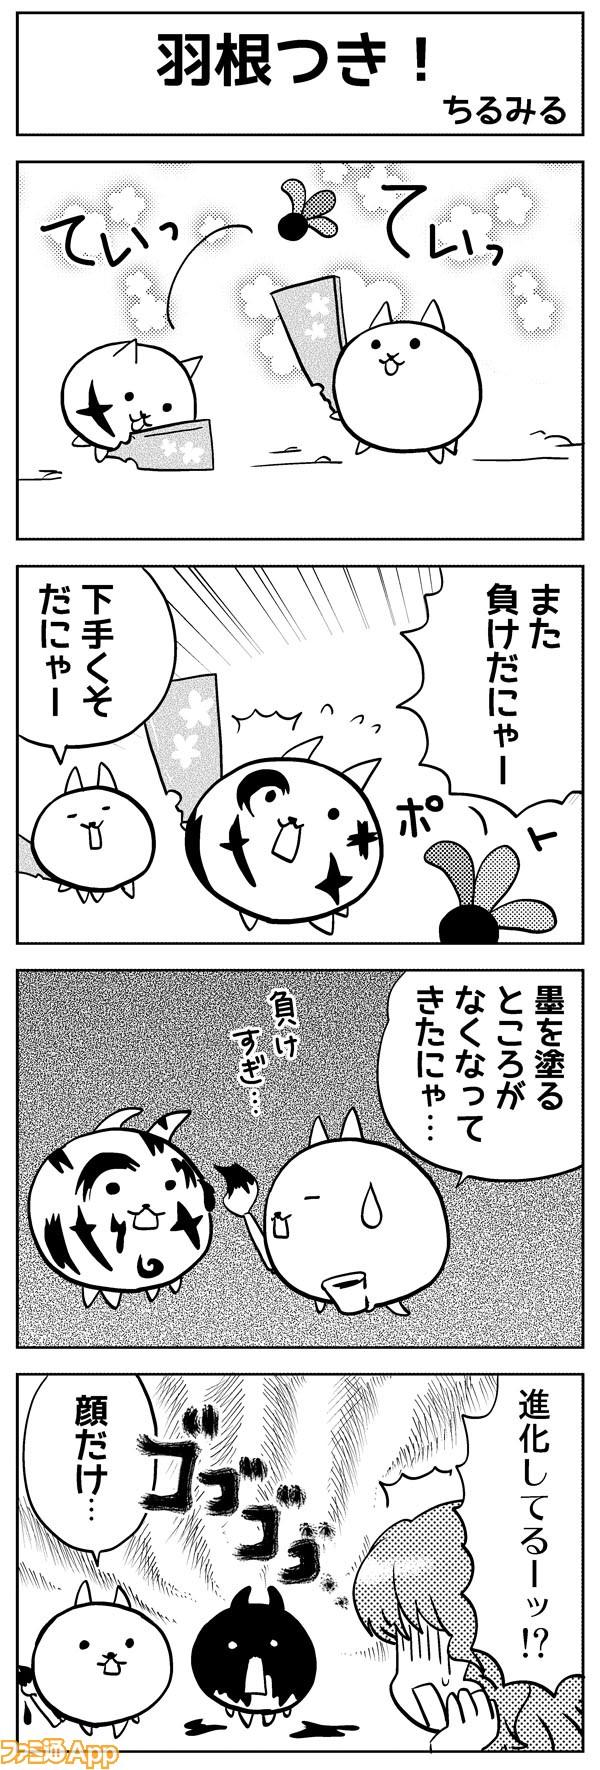 12chiru_001